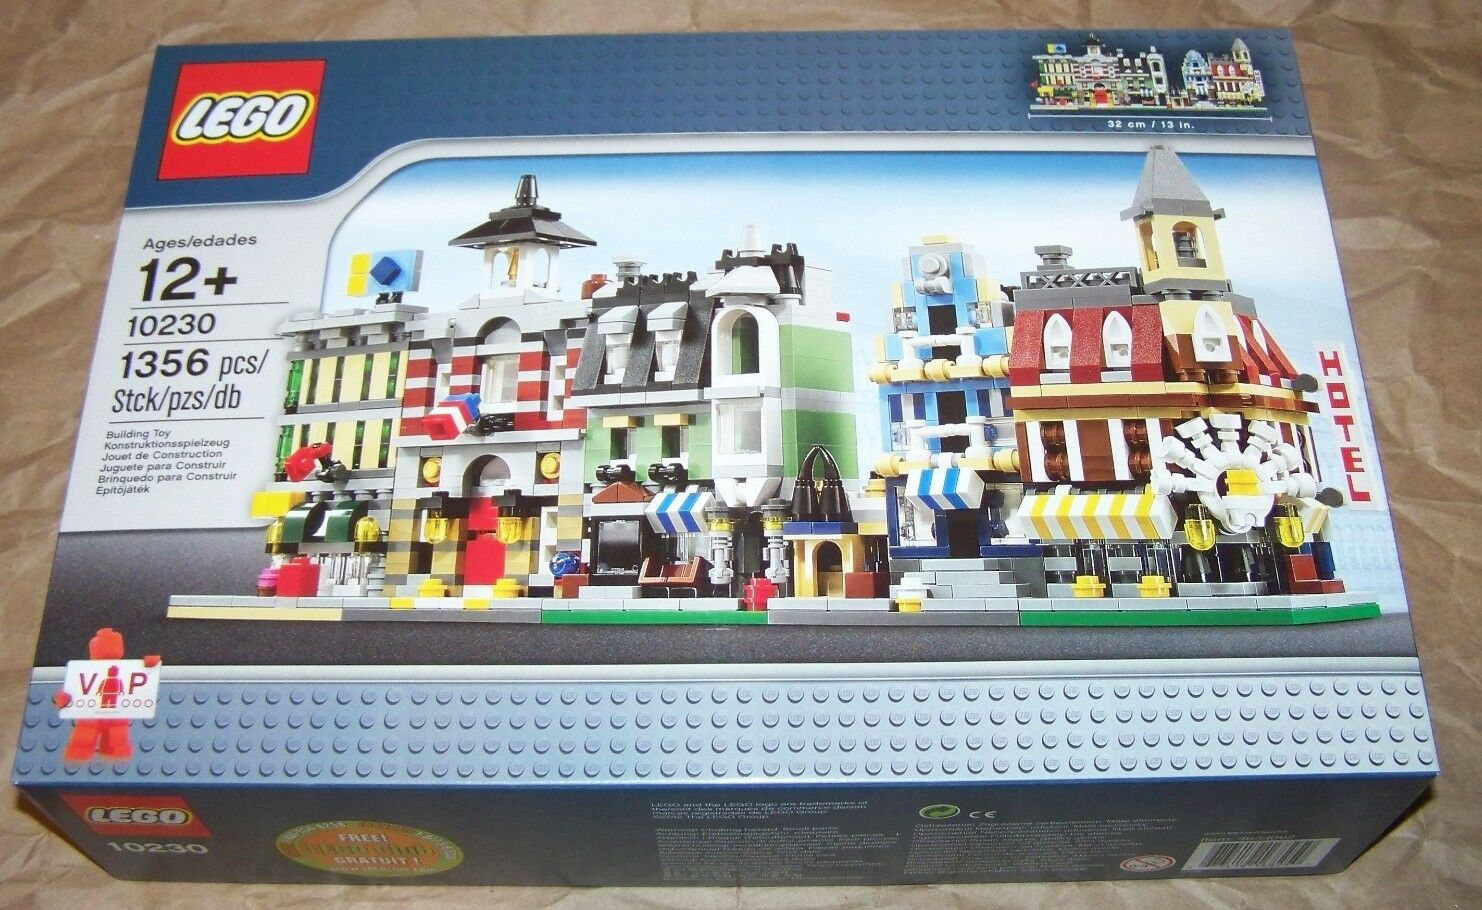 marca LEGO Mini Modulars Modulars Modulars 10230 NIB exclusive retirosso set 1356 pieces  produttori fornitura diretta